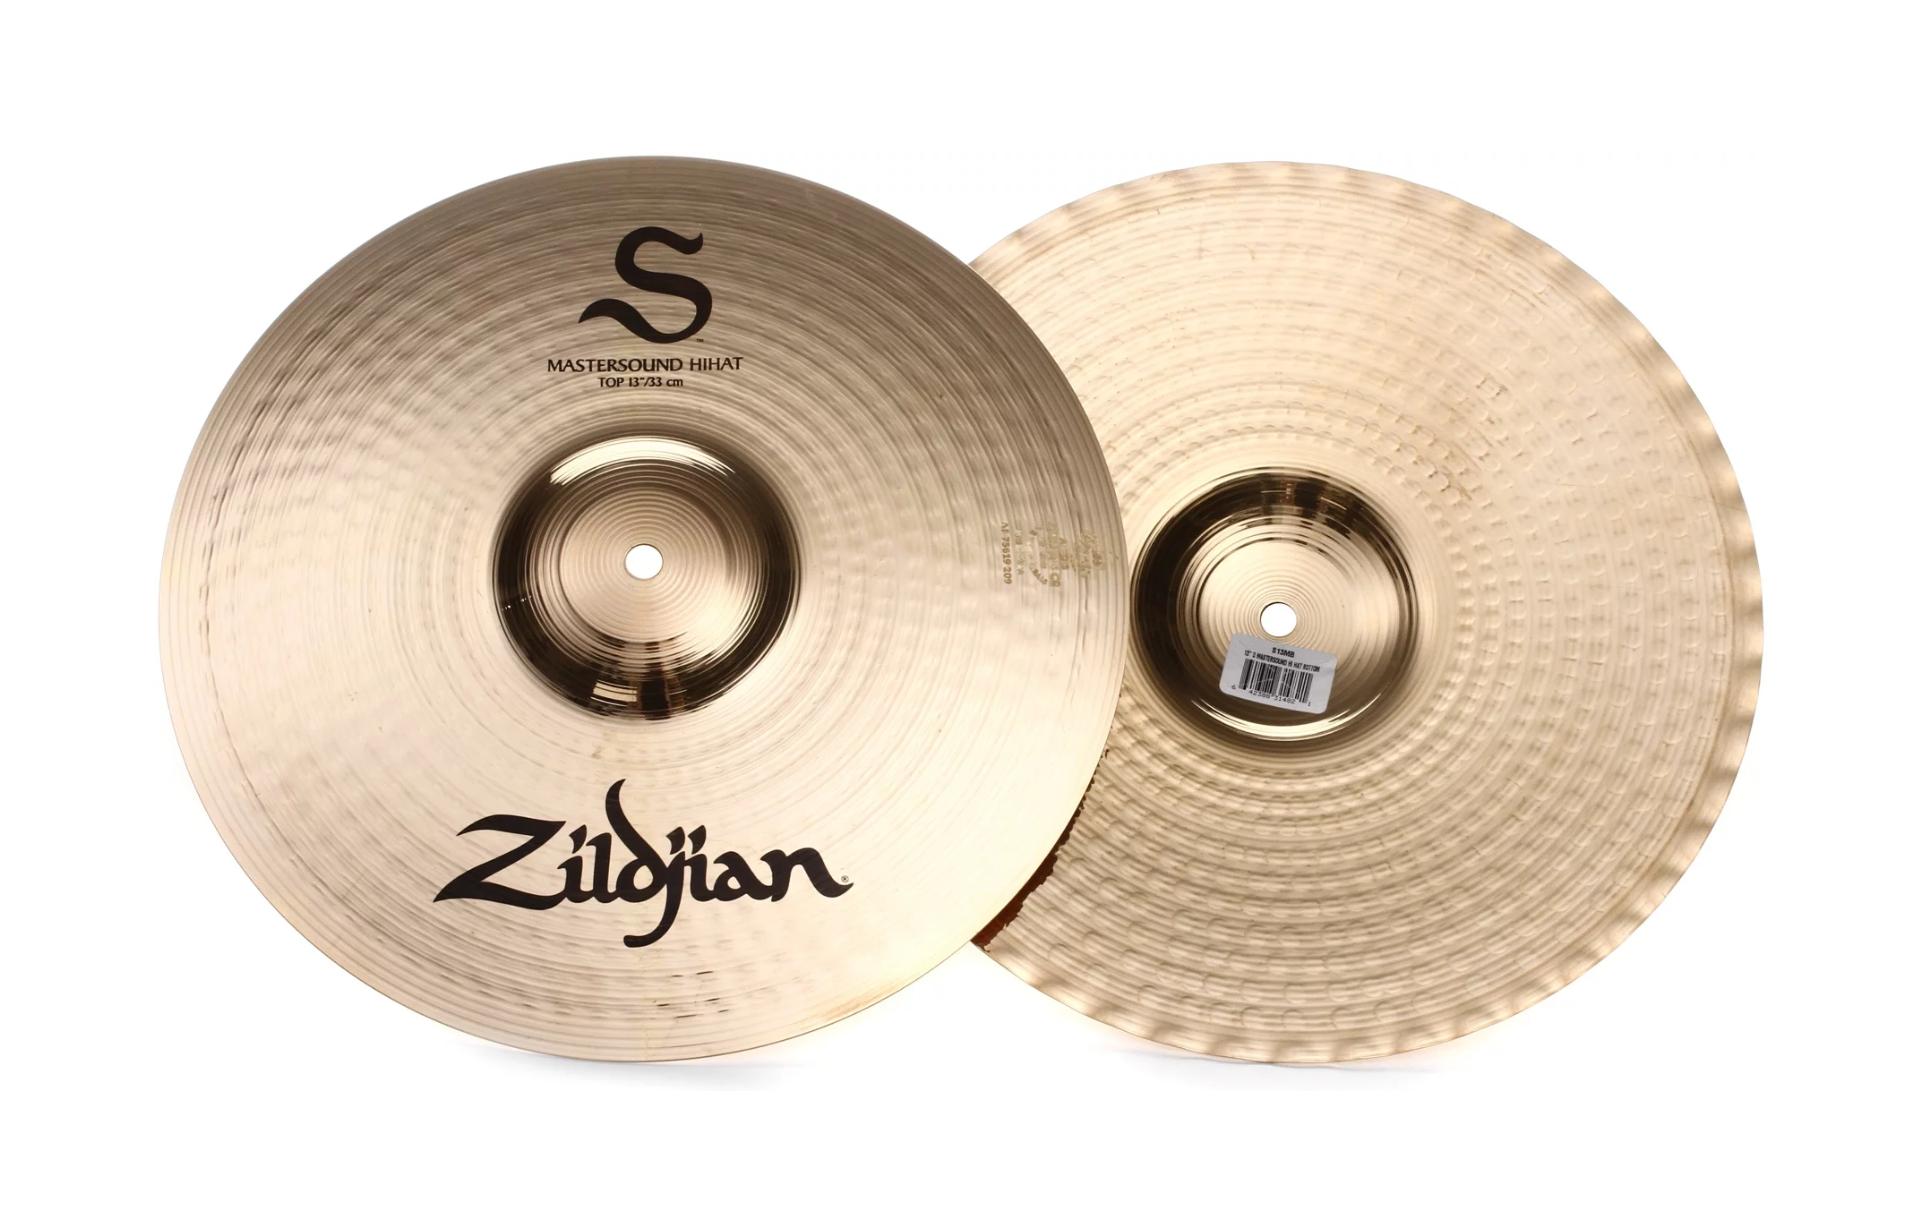 Zildjian S Series 13 Mastersound Hi Hats